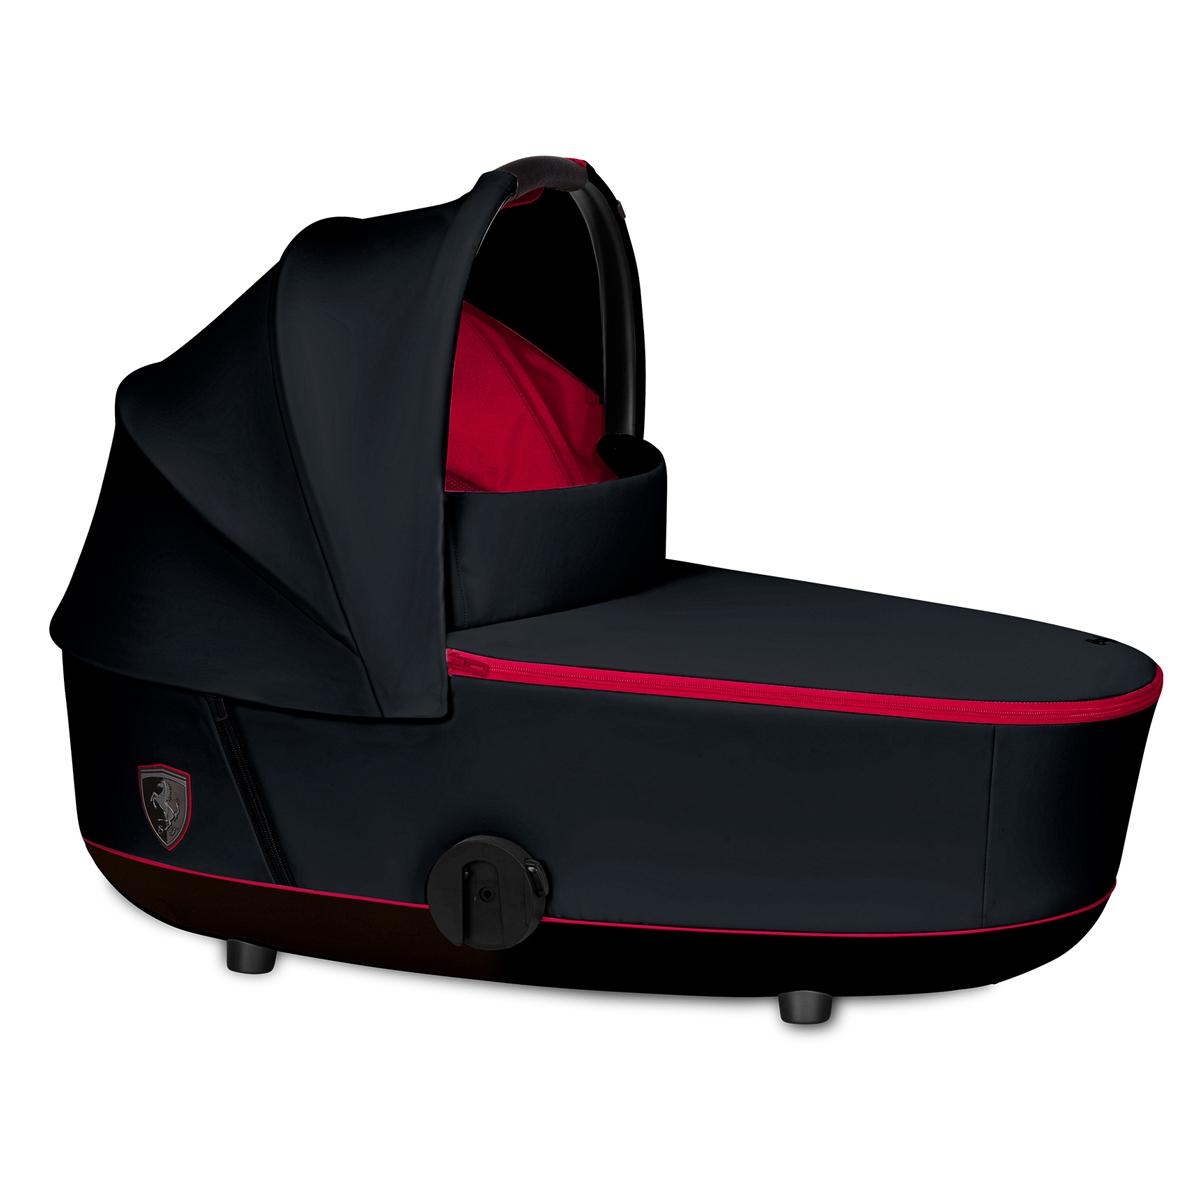 Nacelle Nacelle de Luxe Mios Scuderia Ferrari - Victory Black Nacelle de Luxe Mios Scuderia Ferrari - Victory Black